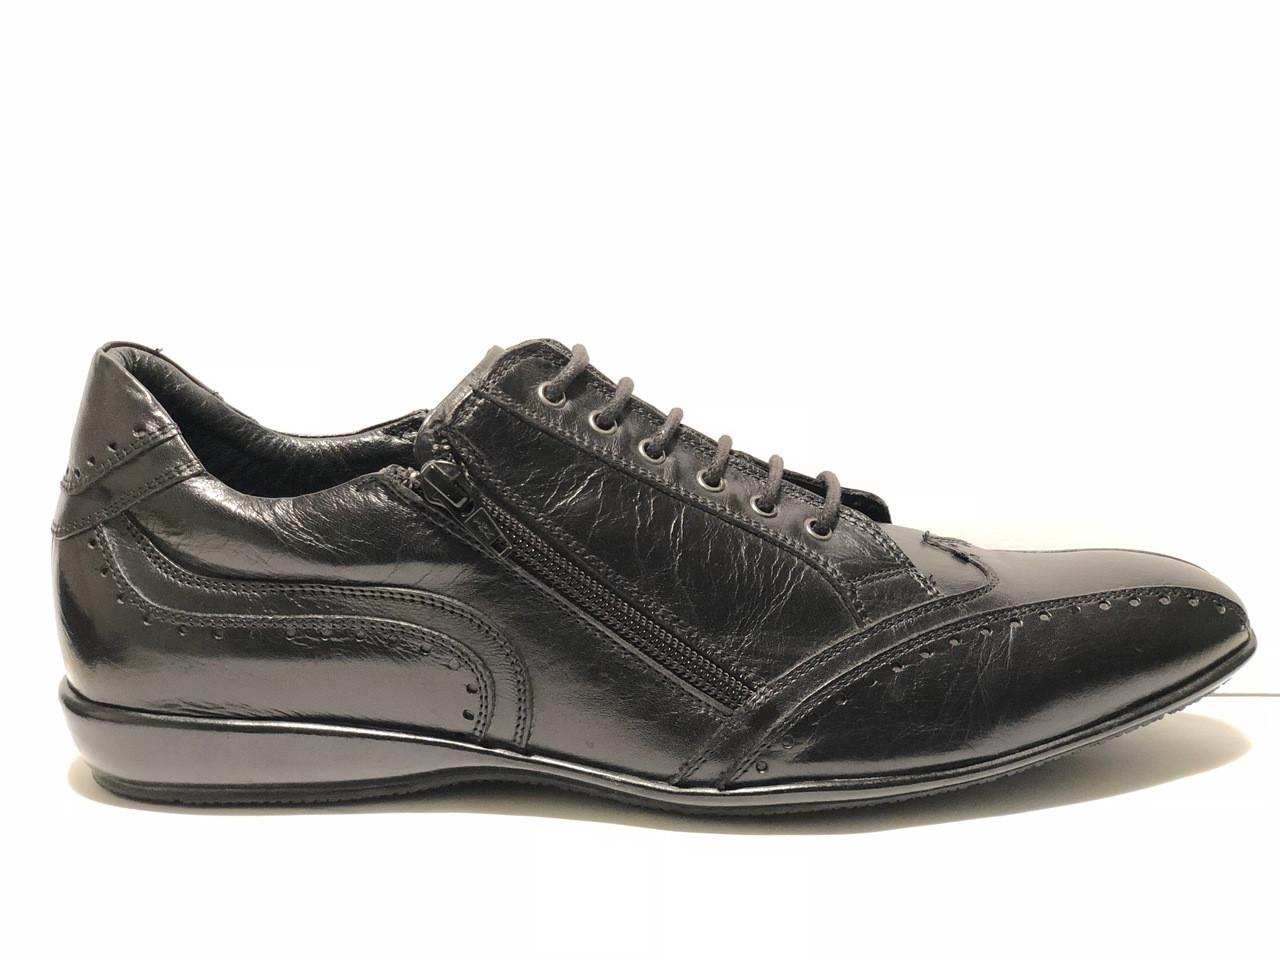 X Bacco Men's Italian sneaker/shoes